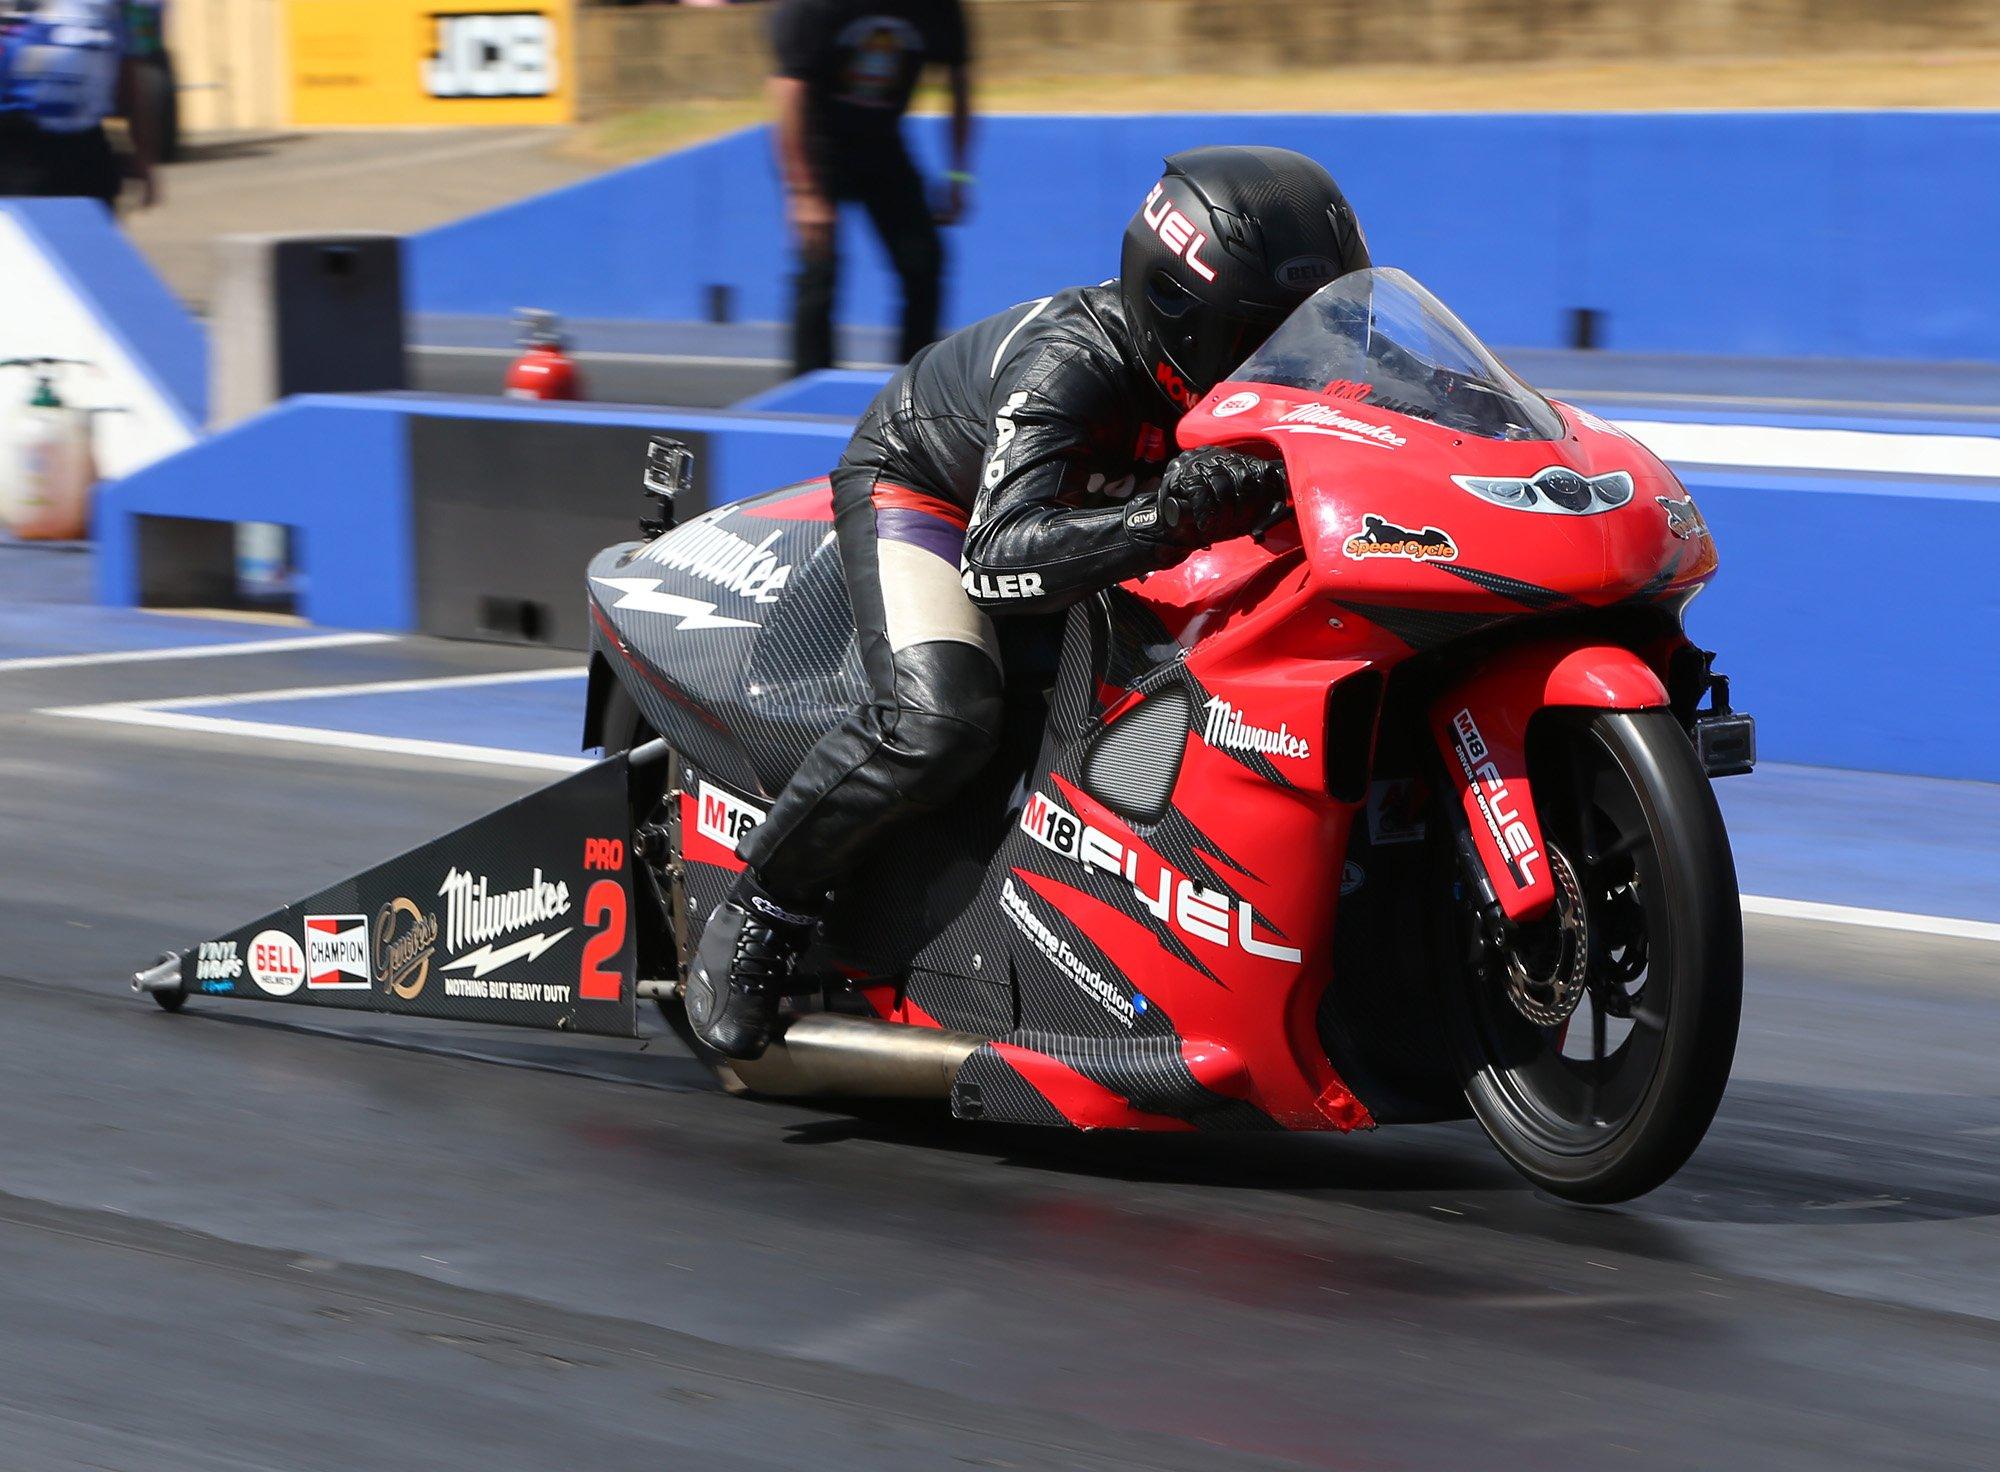 Drag Racing Race Hot Rod Rods Motorbike Motorcycle - Drag Racing Bike - HD Wallpaper